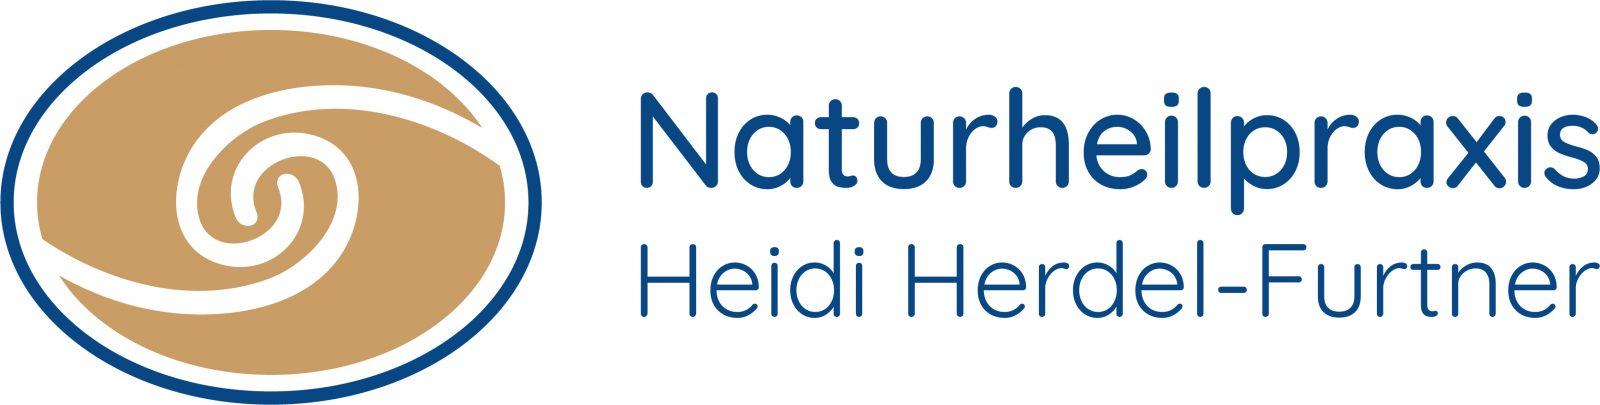 Naturheilpraxis Heidi Herdel-Furtner